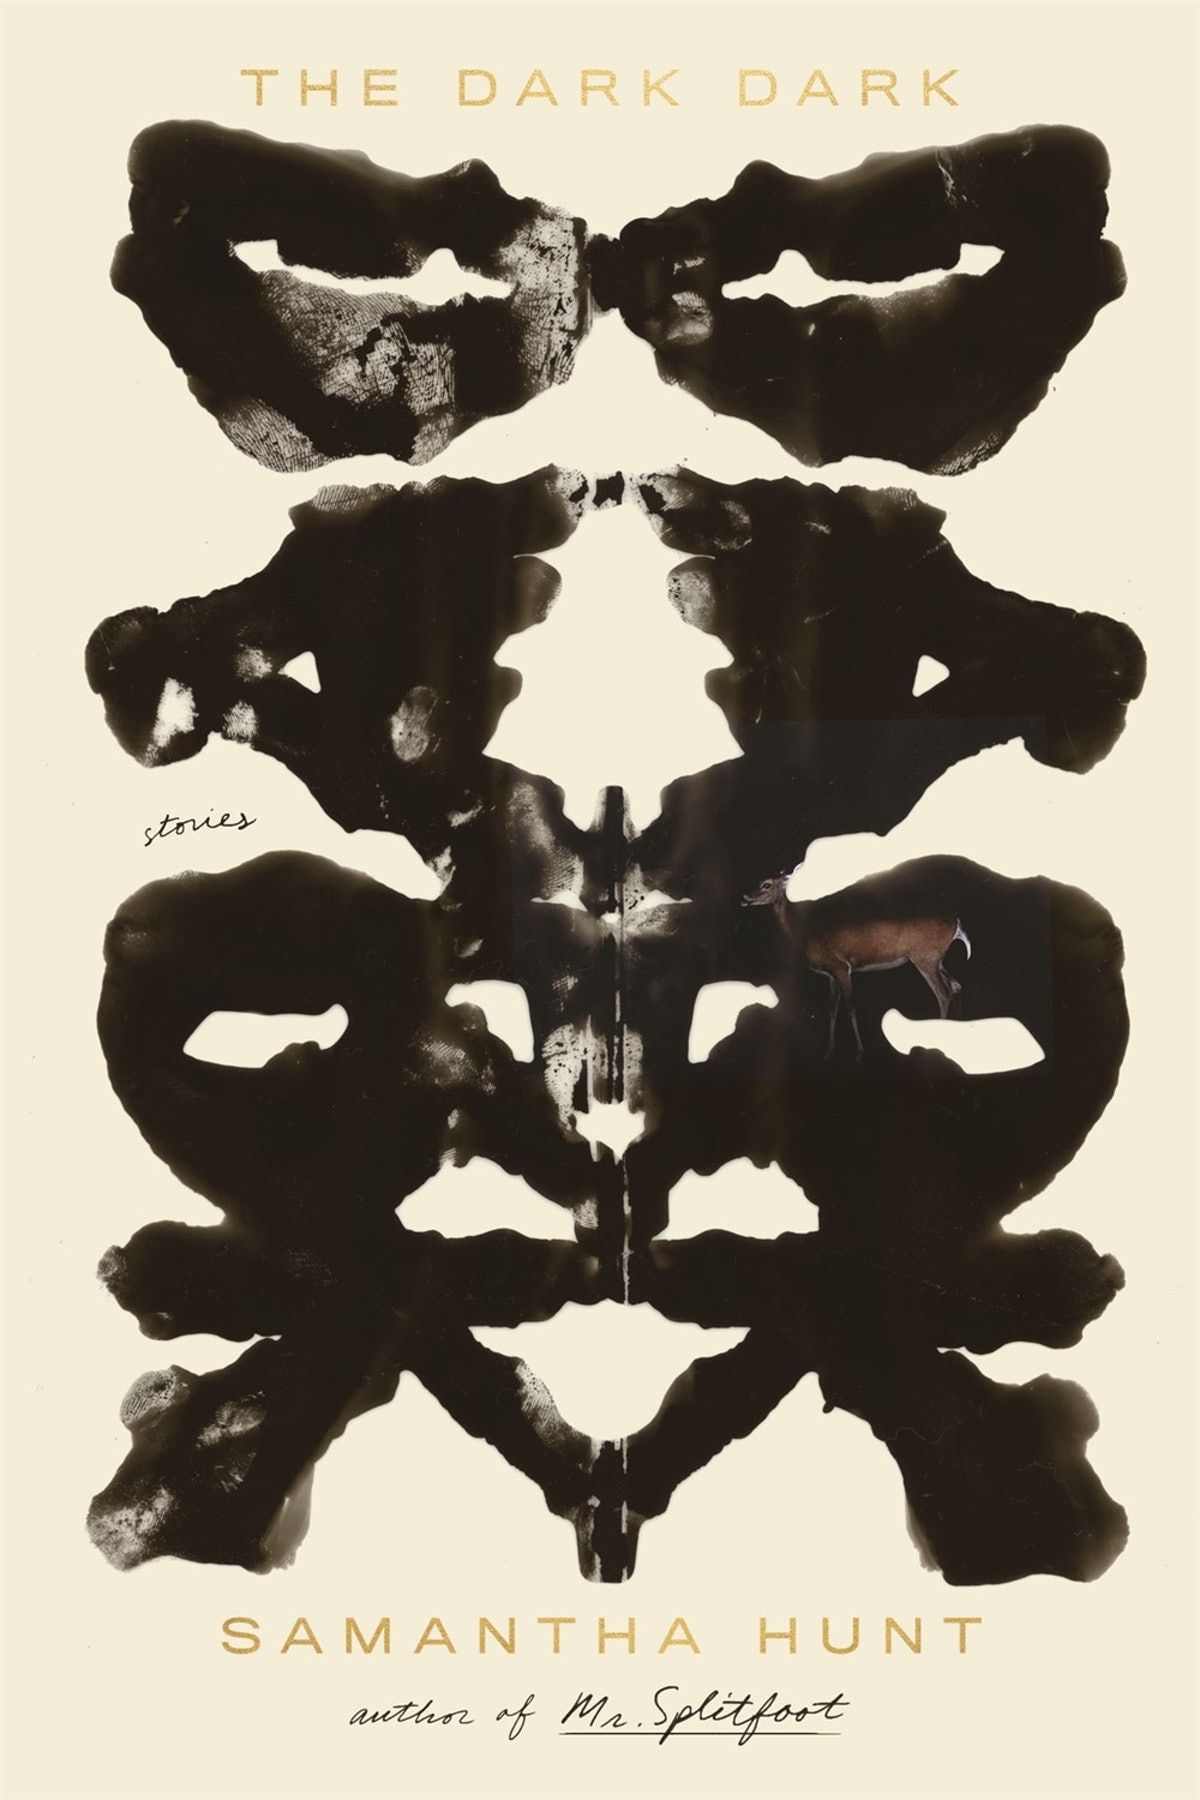 DarkDark.jpg